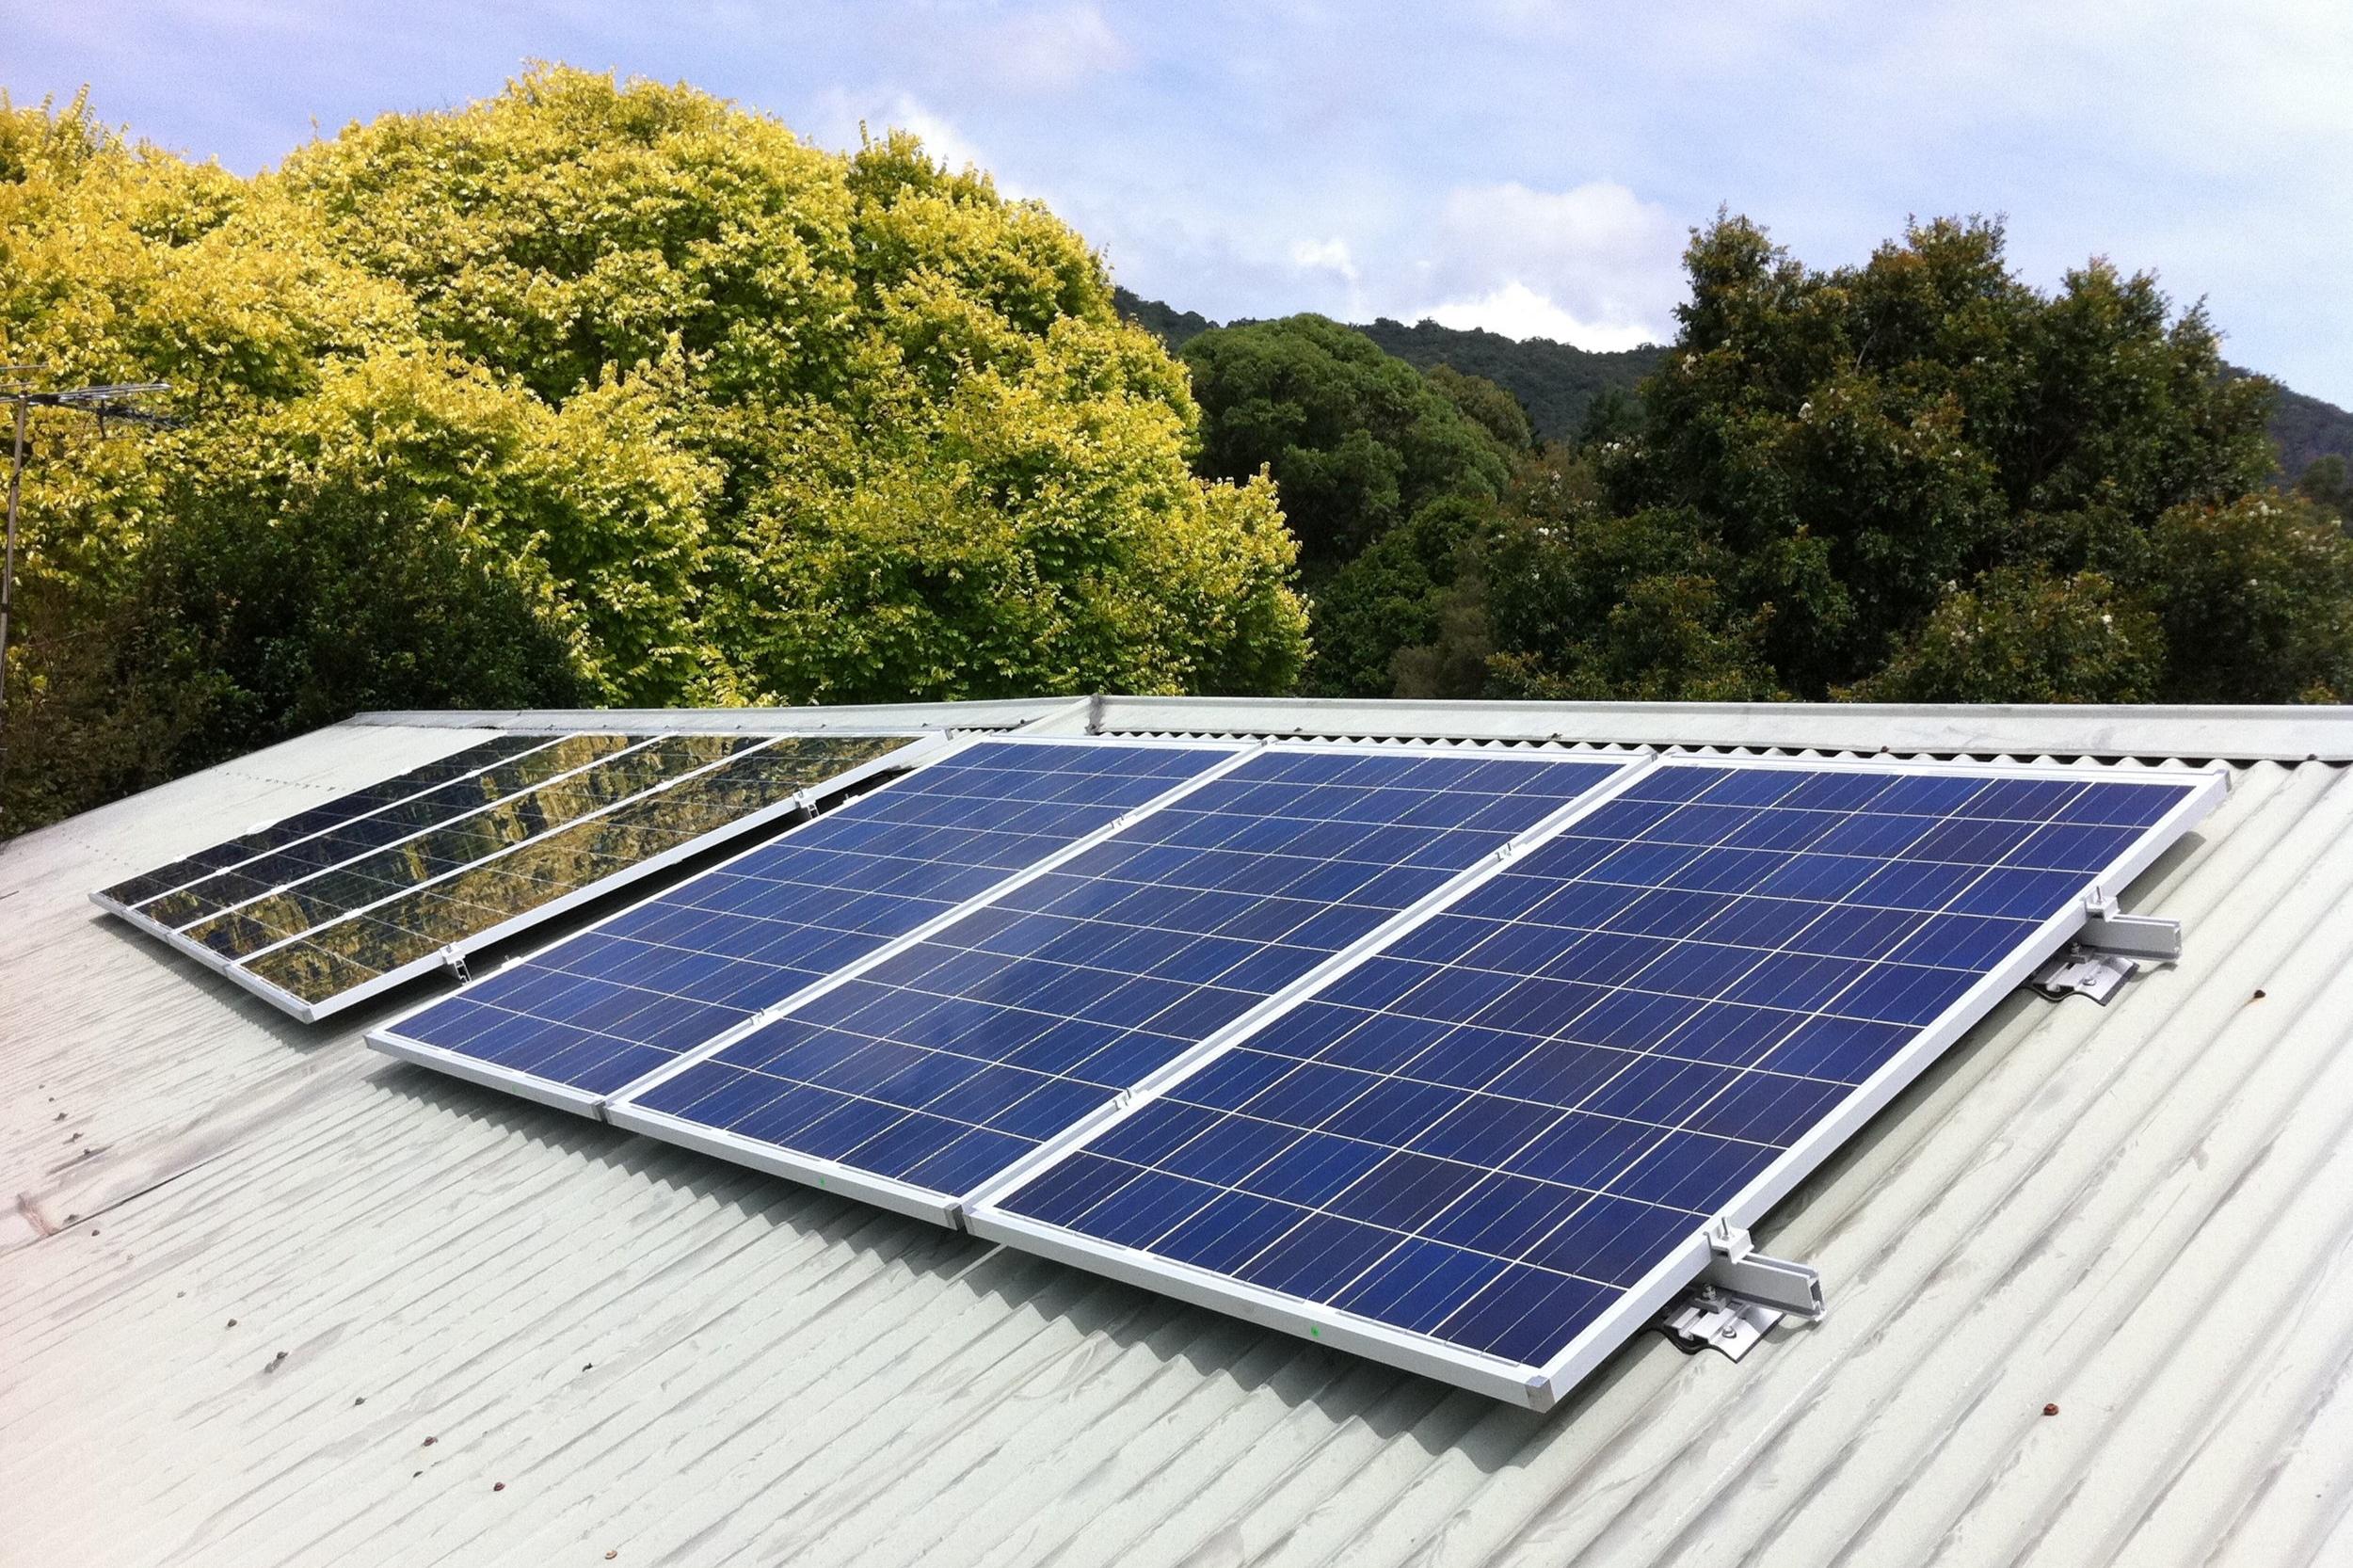 2011: 1.61kWp SolarWorld AG system